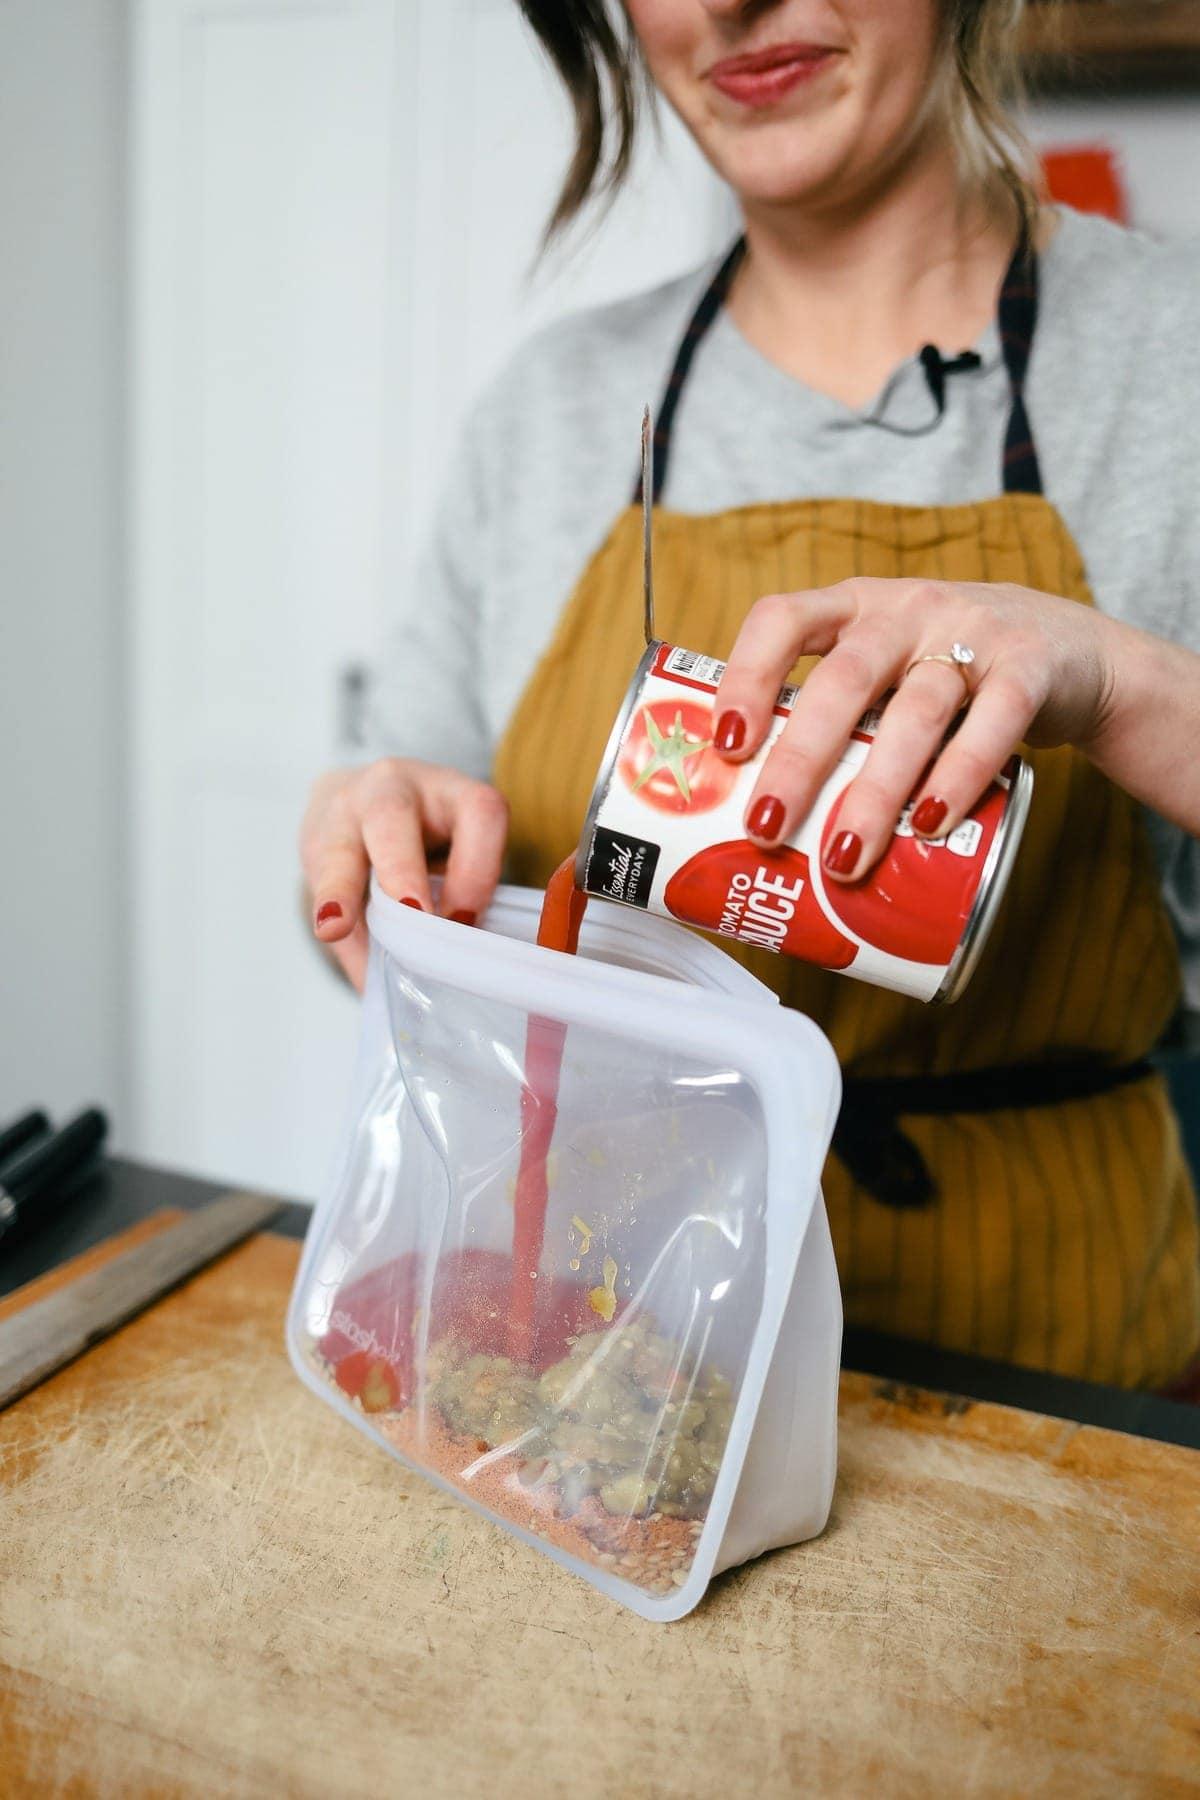 Preparing Instant Pot Lenti Tacos